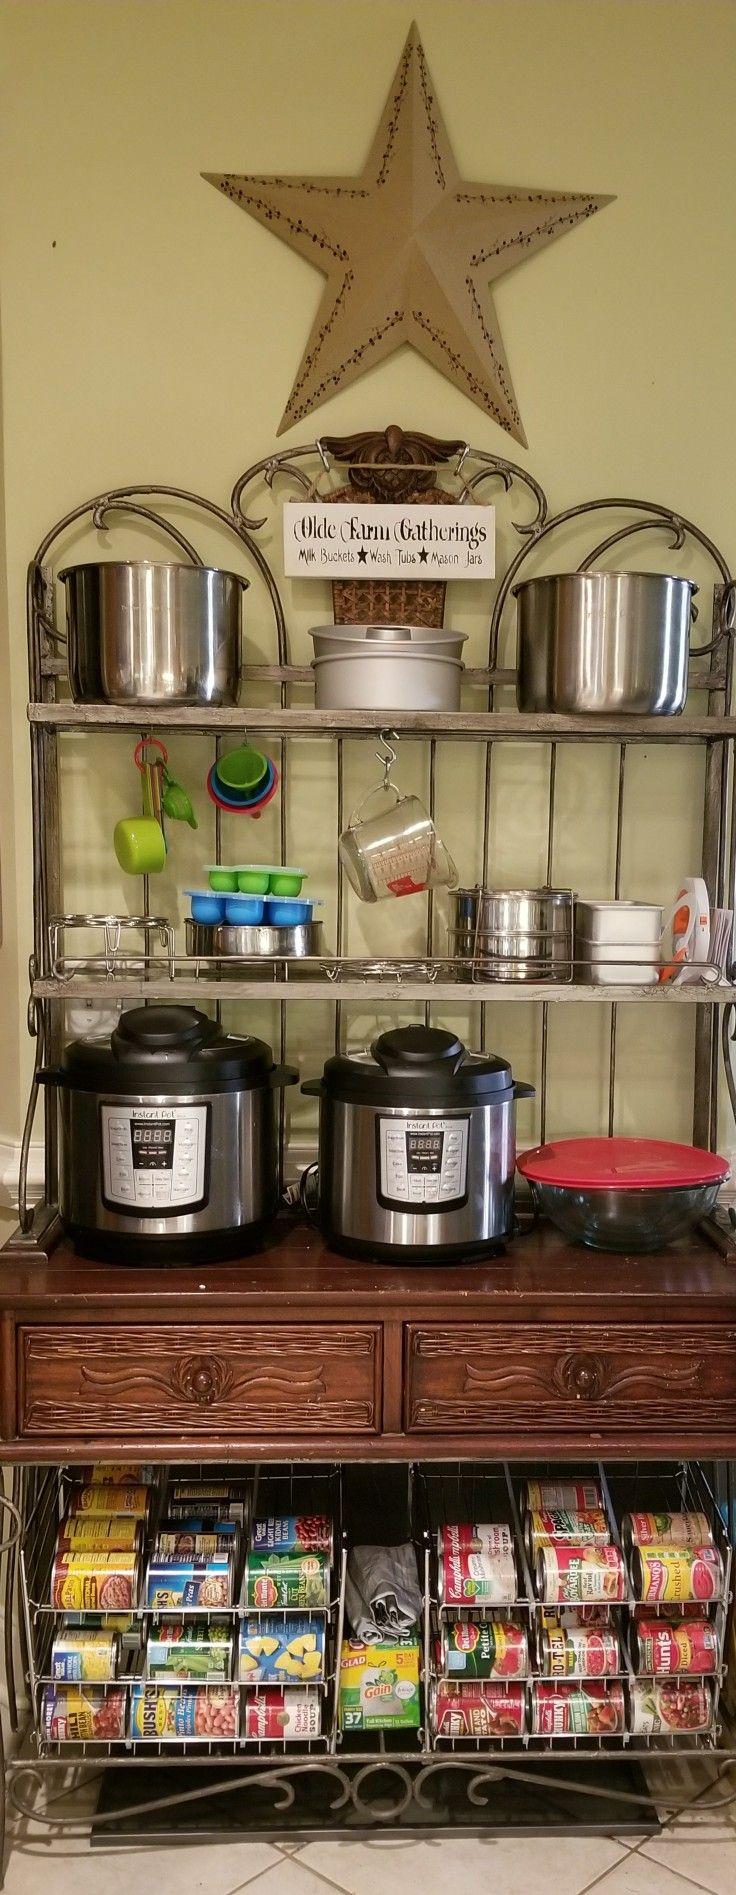 Beau Instant Pot Shelf Storage | Instant Pot Storage | Pinterest | Pot Storage,  Instant Pot And Storage